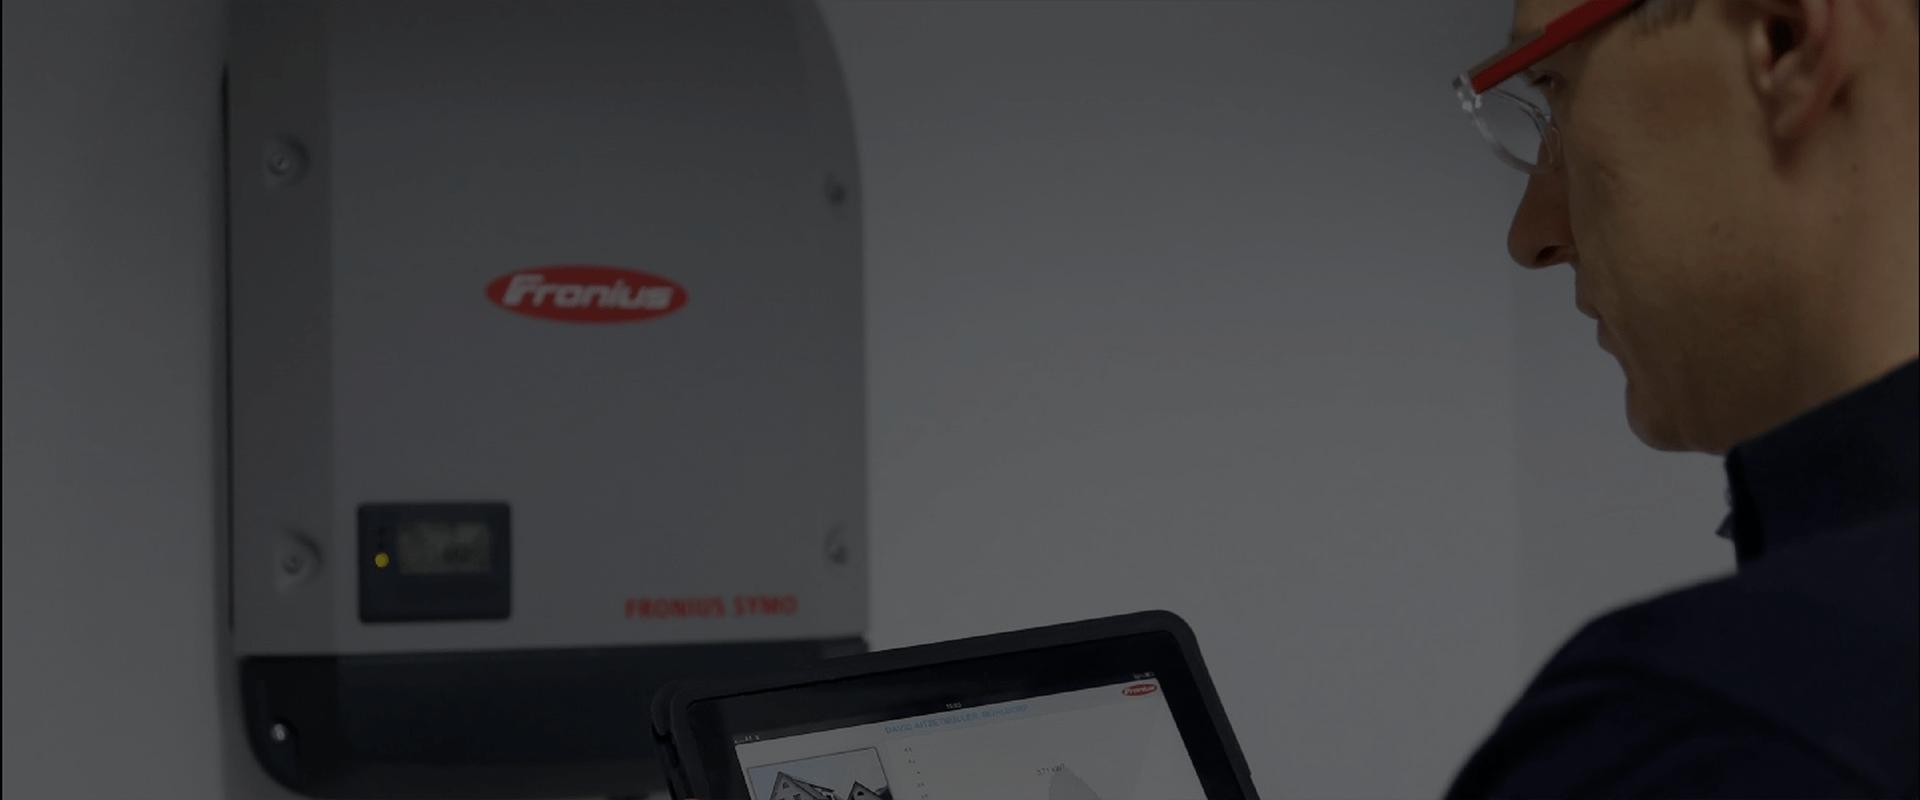 Fronius Solar Inverter Installed